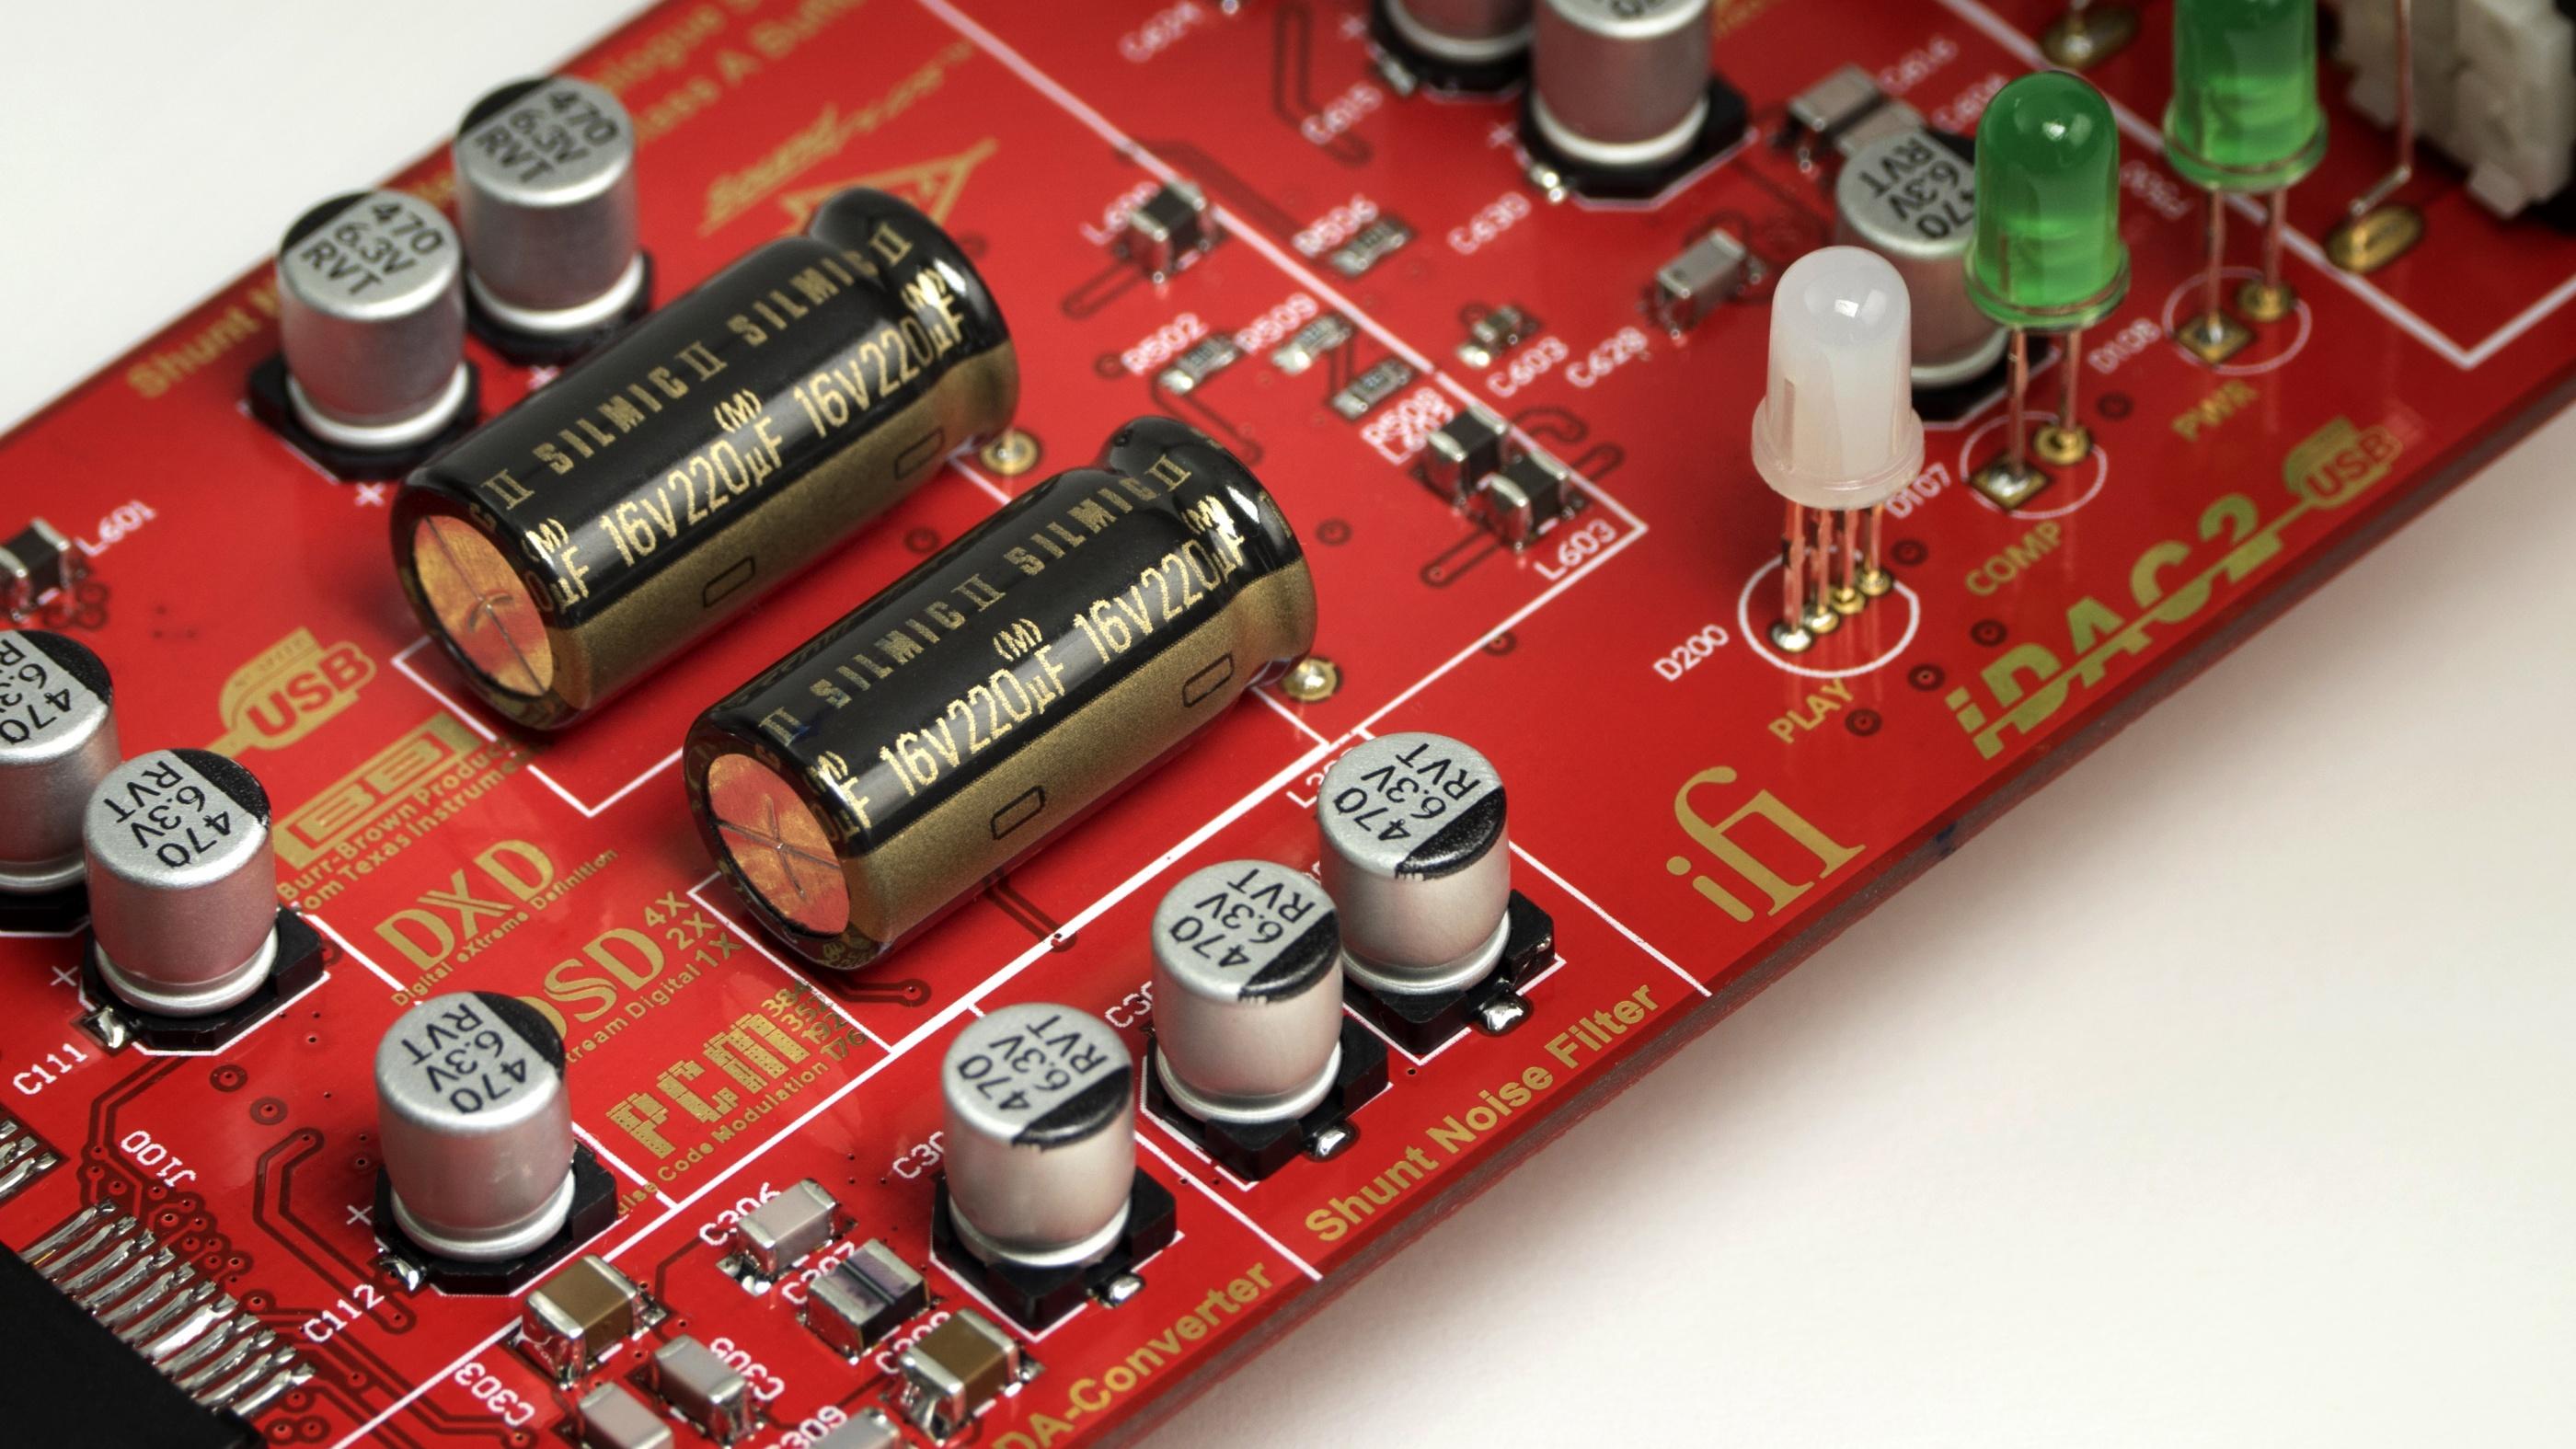 Idac 2 Quad Dsd256 Pcm 384khz Usb Dac Headphone Amp Block Diagram Of The Amplifier Ip Core With Silmics